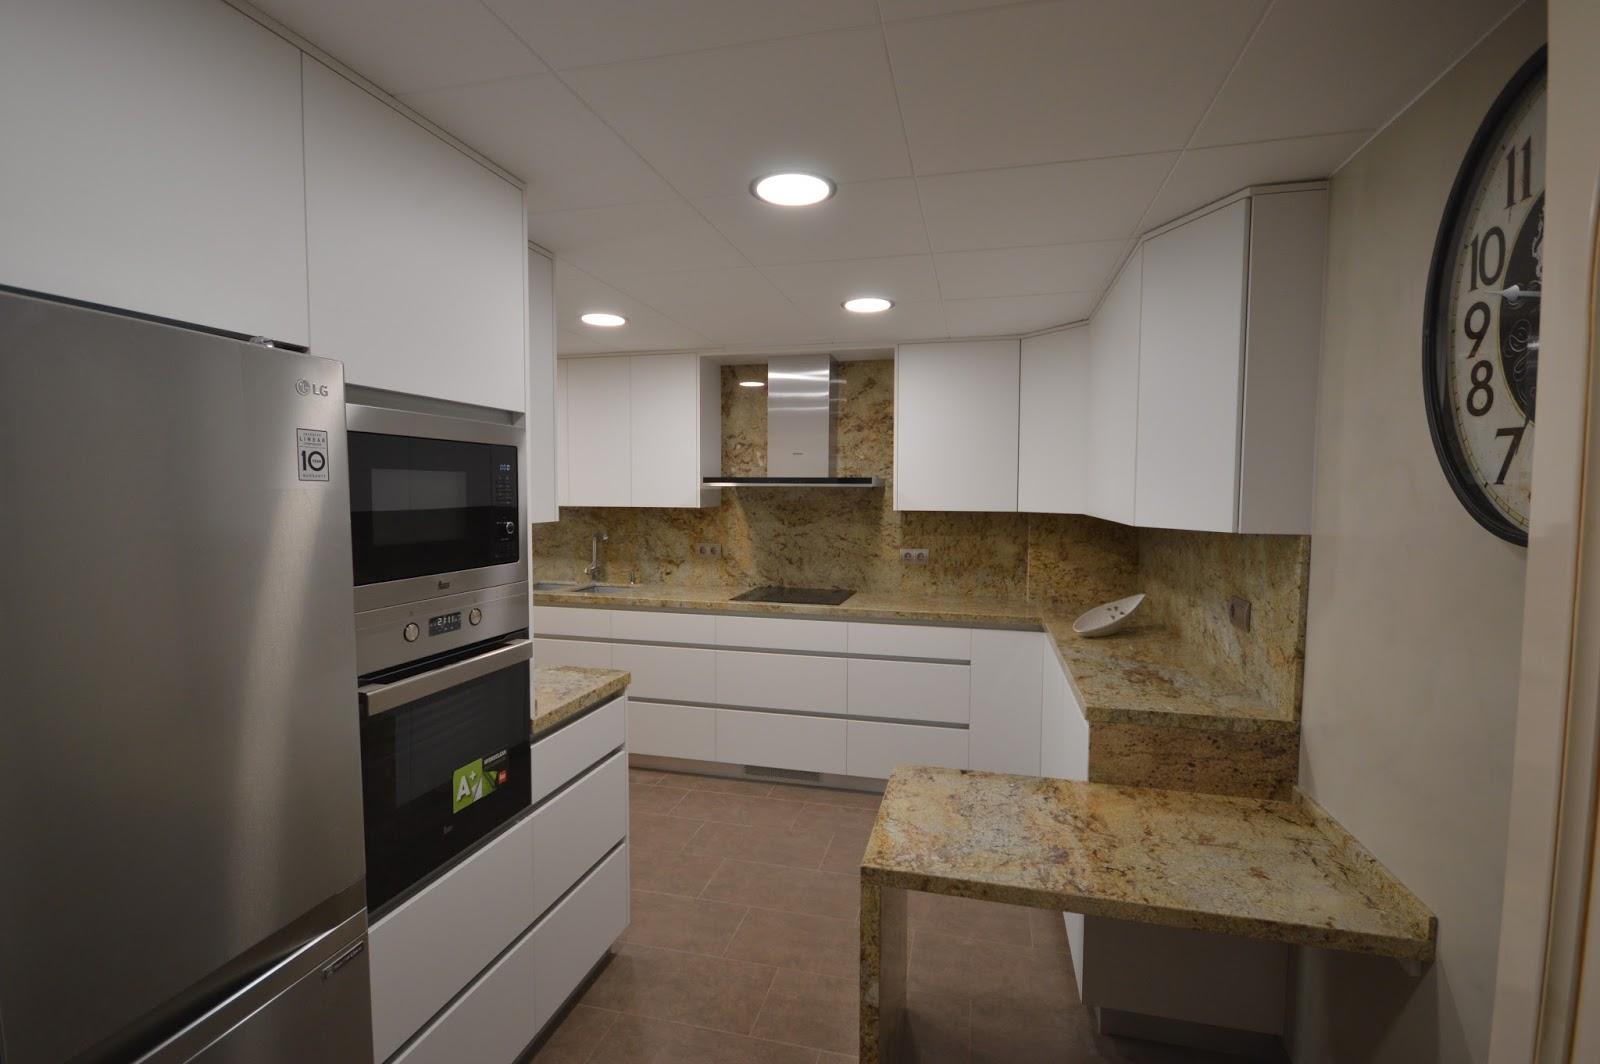 Reuscuina muebles de cocina blanco mate sin tiradores for Muebles de cocina sin tiradores